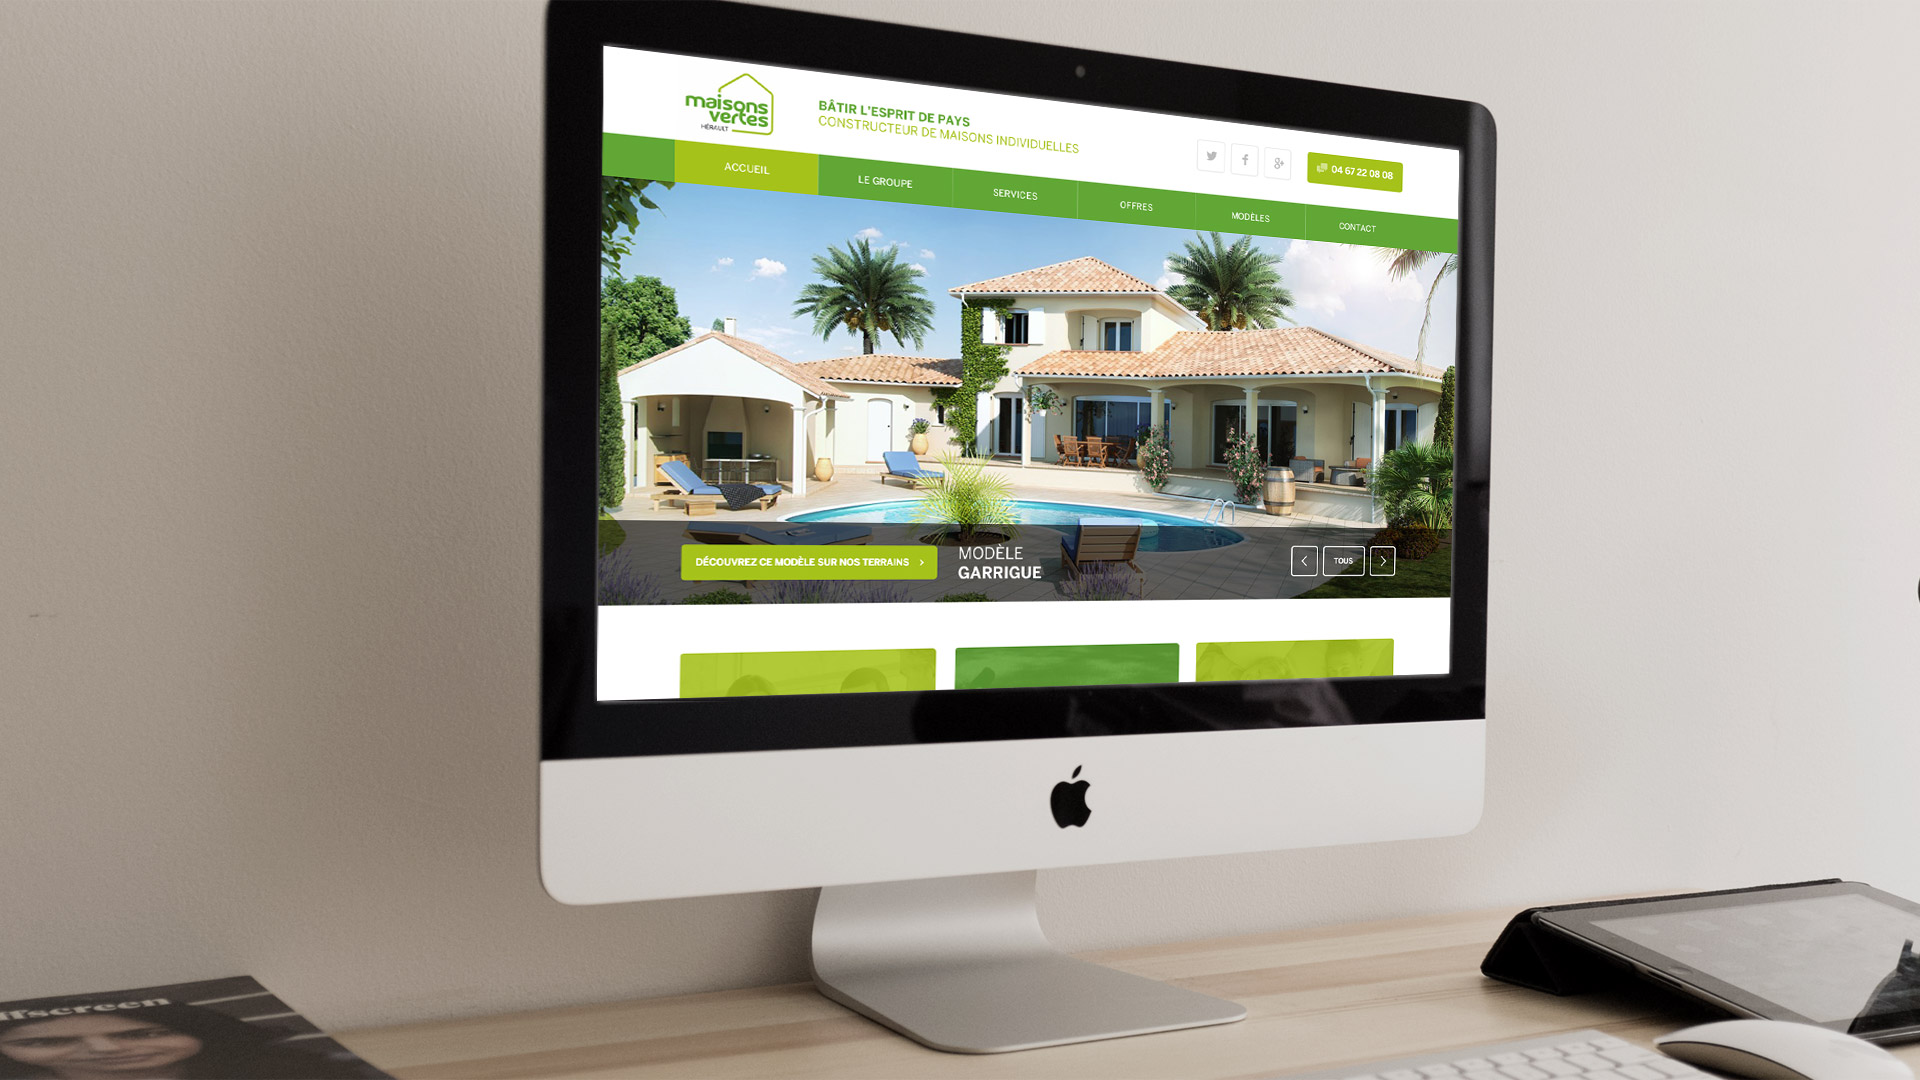 maisons-vertes-creation-webdesigner-site-web-caconcept-alexis-cretin-graphiste-montpellier